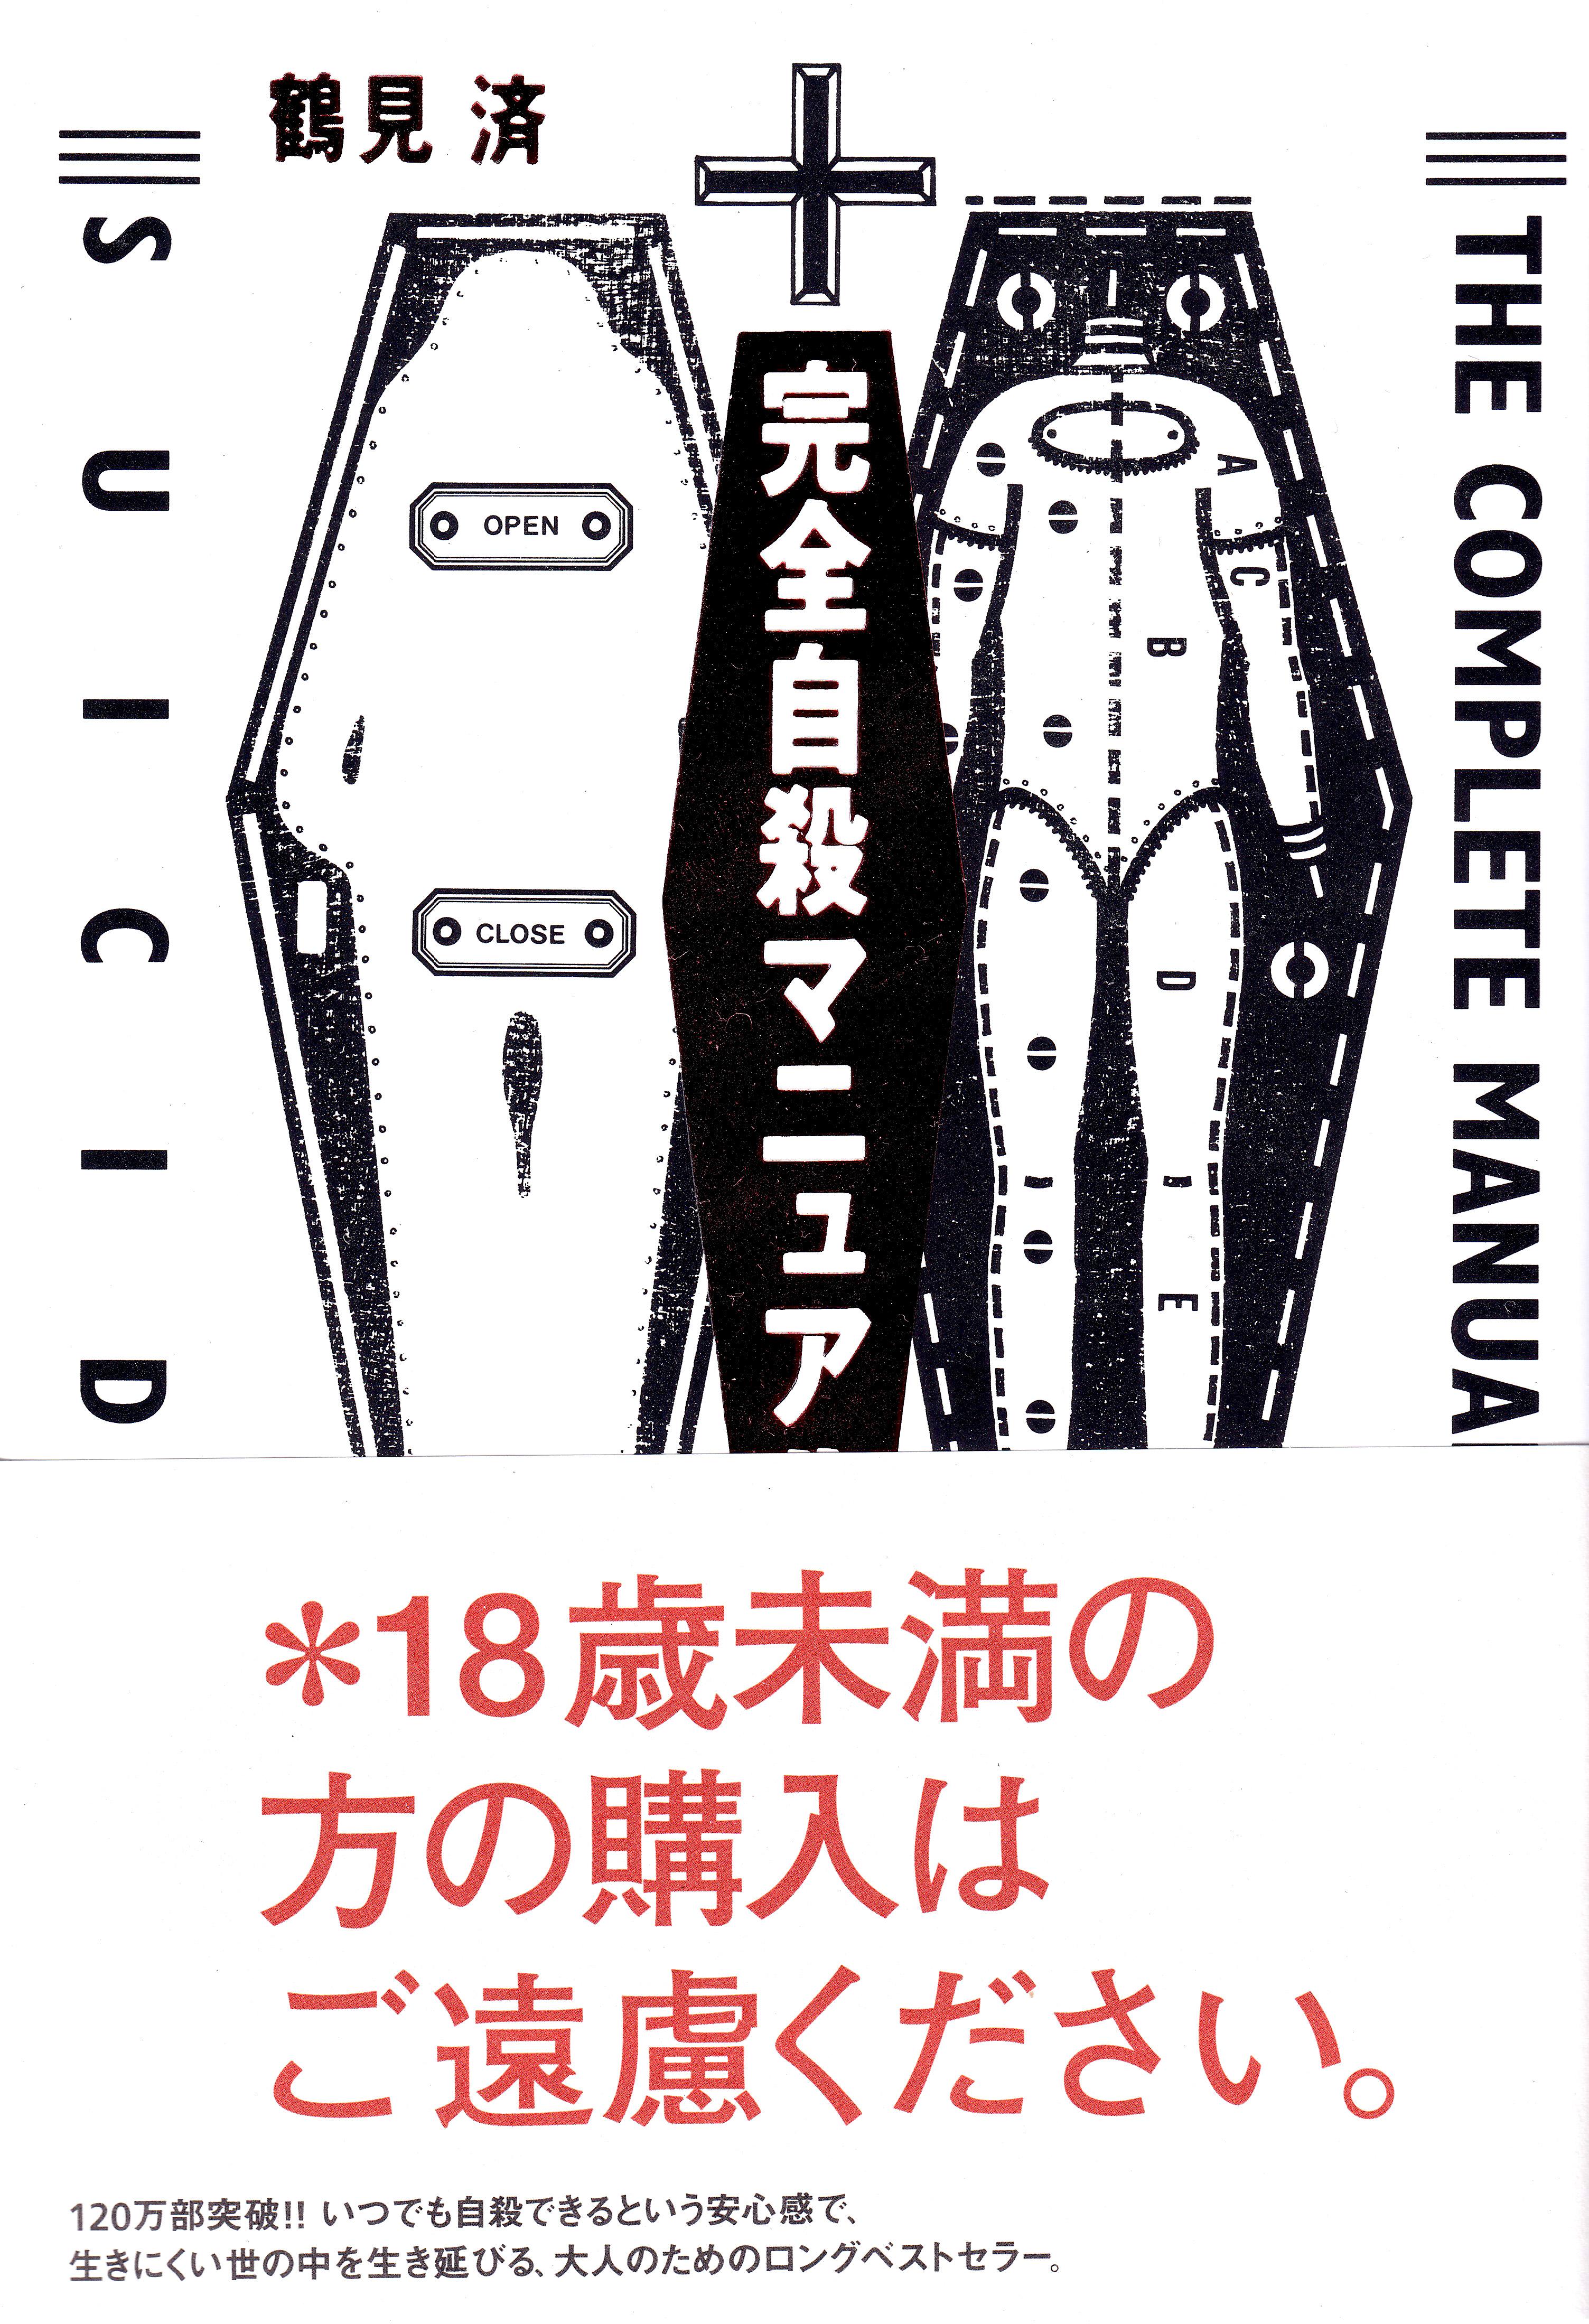 f:id:kougasetumei:20200104192007j:image:w400